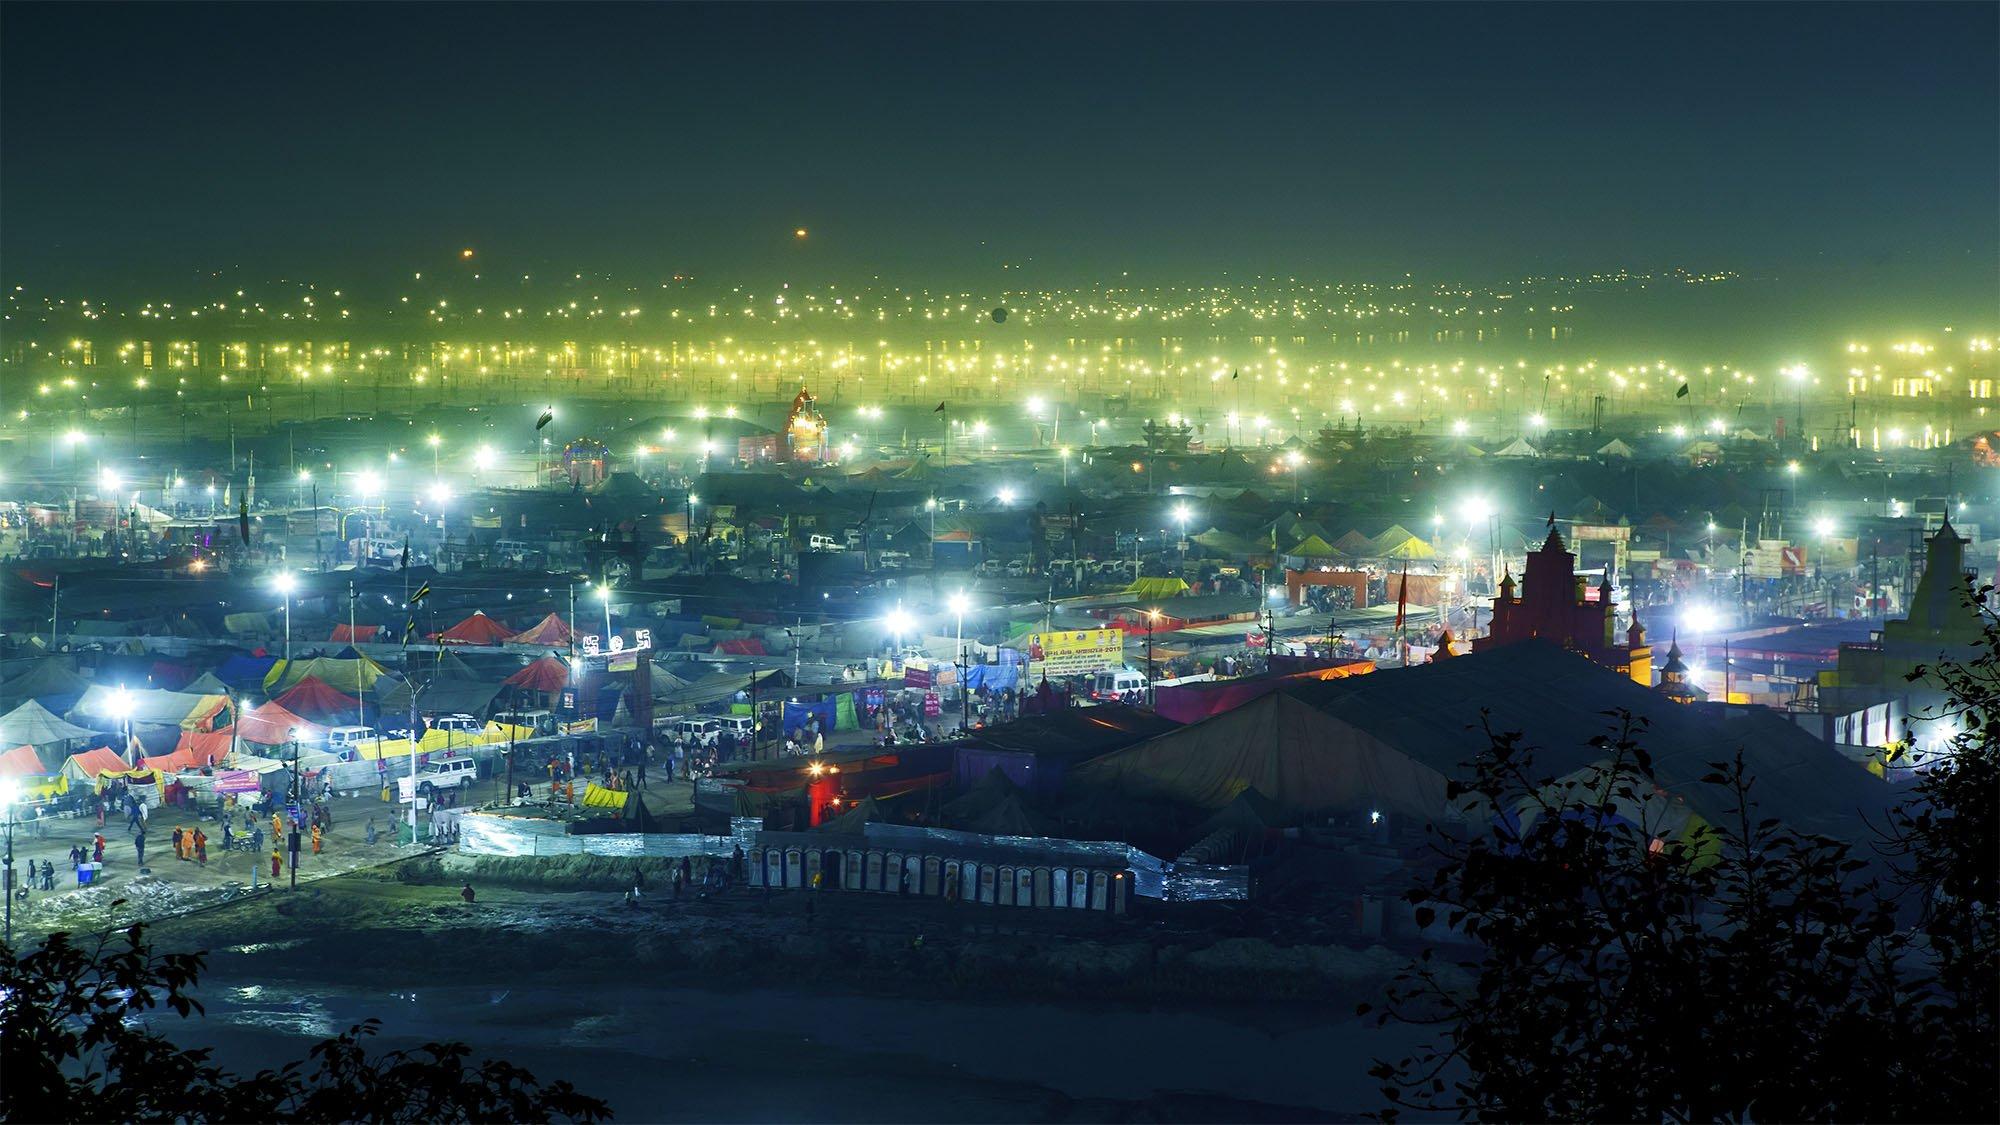 Kumbh Mela photography at night